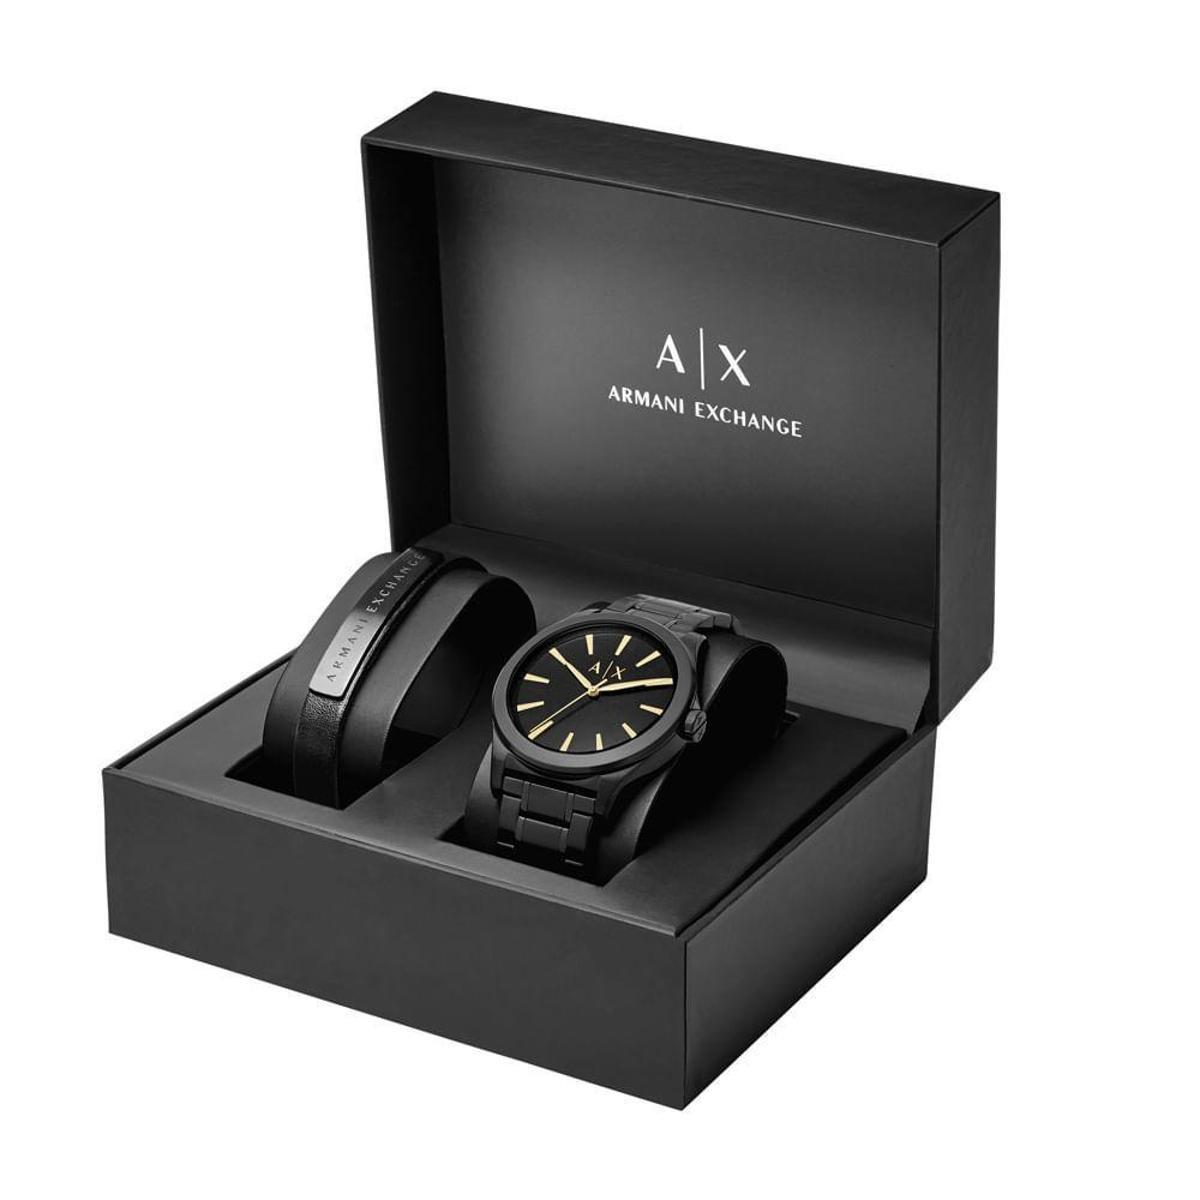 cc0233e67f0c8 Relógio Armani Exchange Masculino Nico - AX7102 8PN AX7102 8PN ...